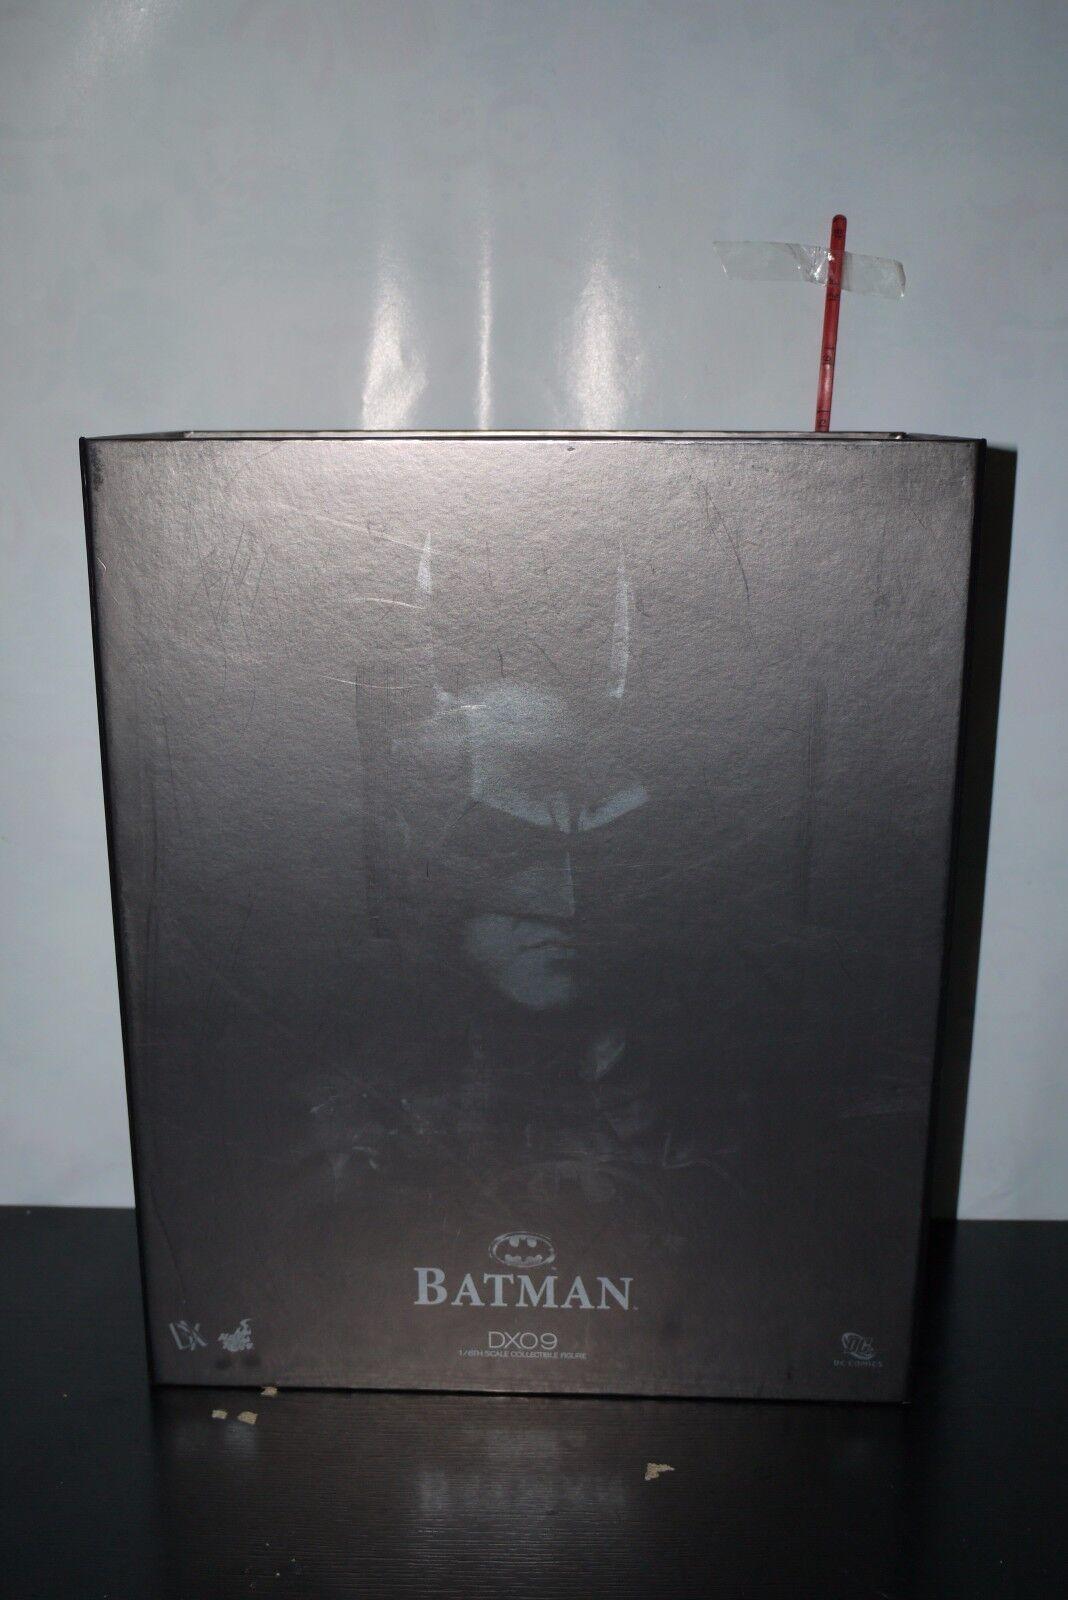 Hot Toys DX09 BATMAN EMPTY BOX ONLY NO FIGURE